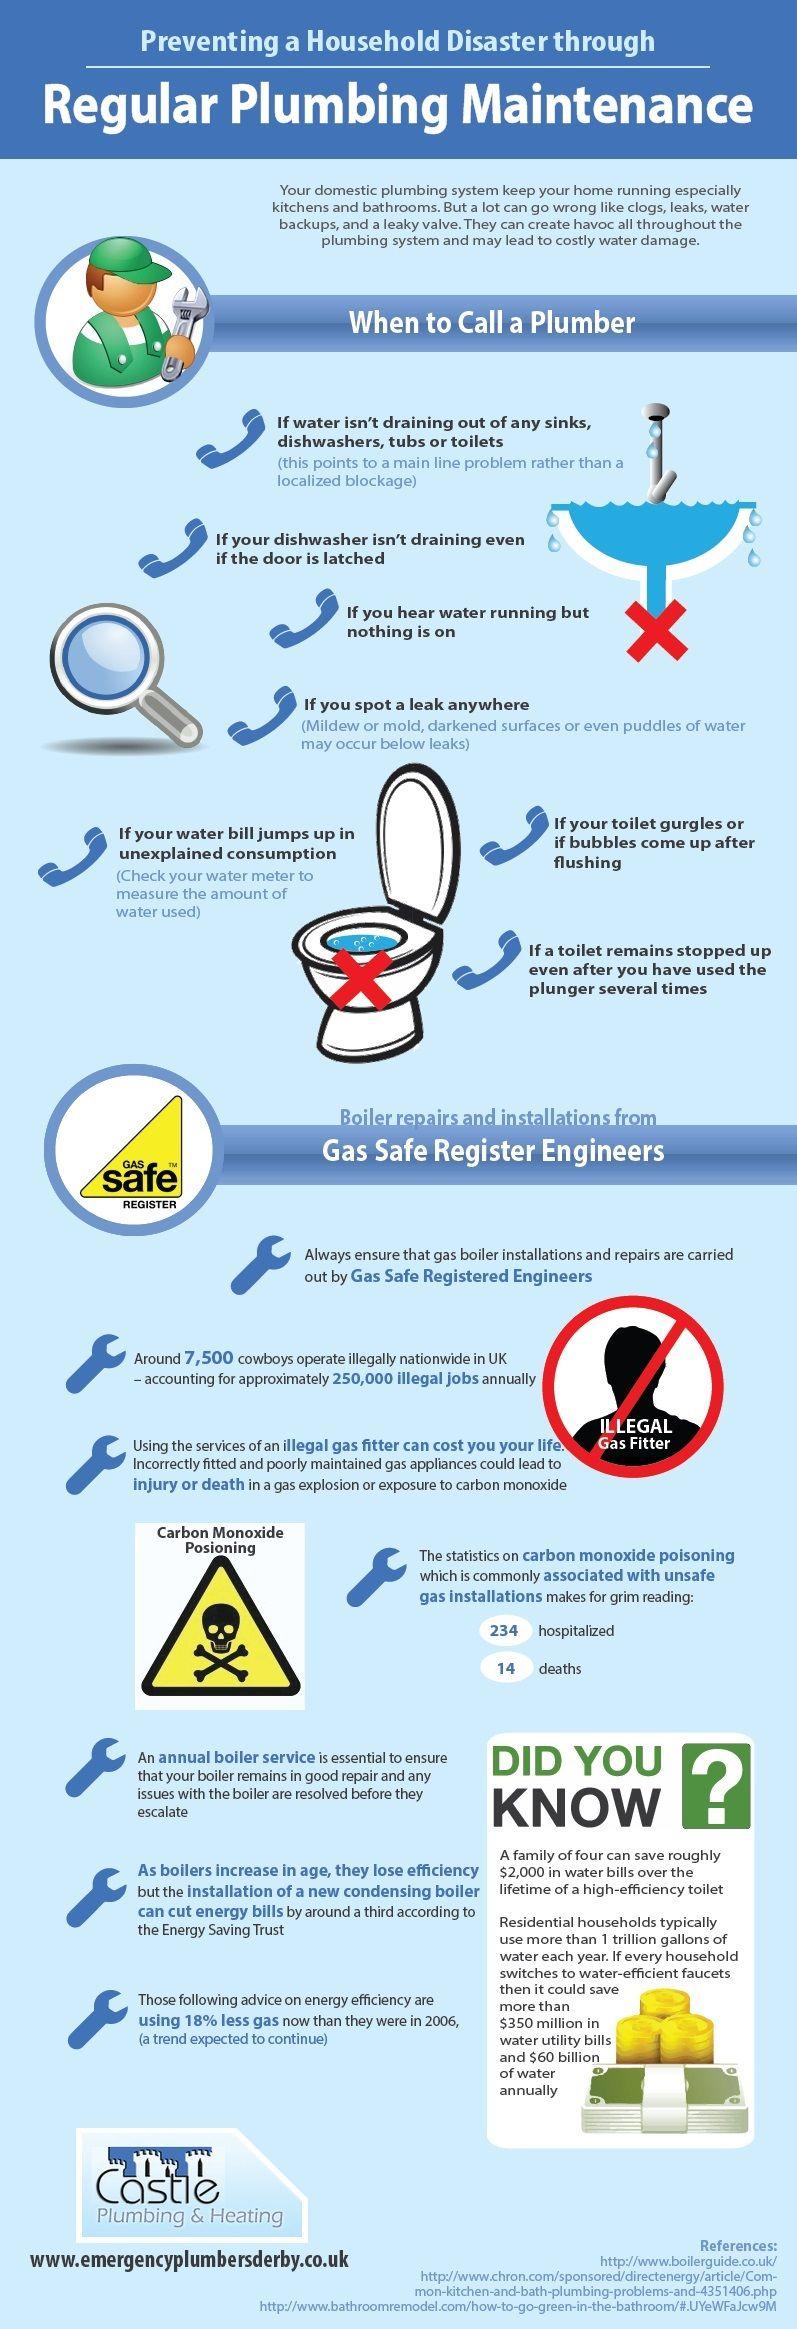 Preventing a Household Disaster through Regular Plumbing Maintenance ...